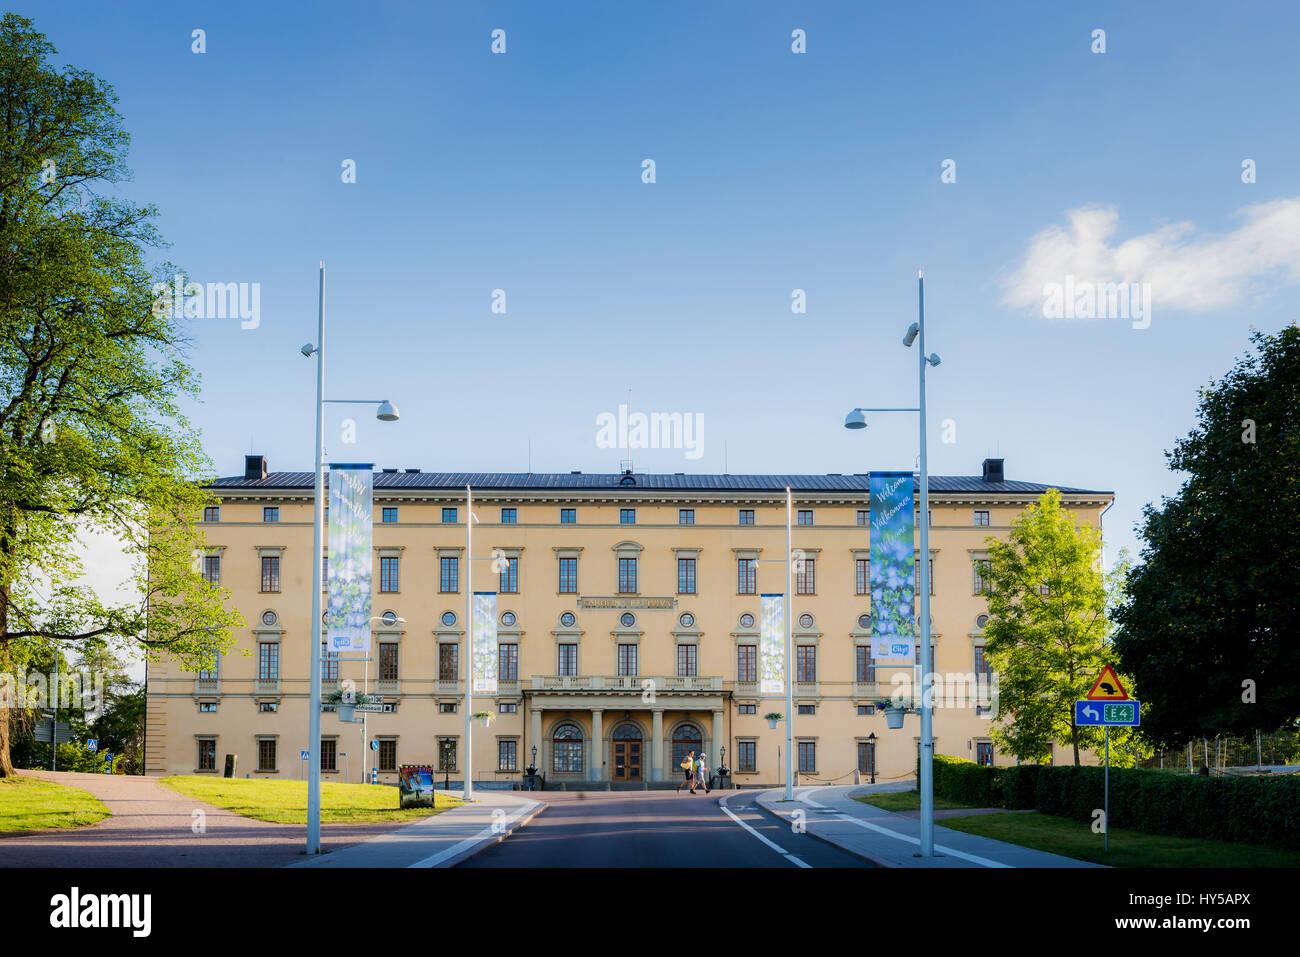 Sweden, Uppland, Uppsala, Facade of University Library Stock Photo